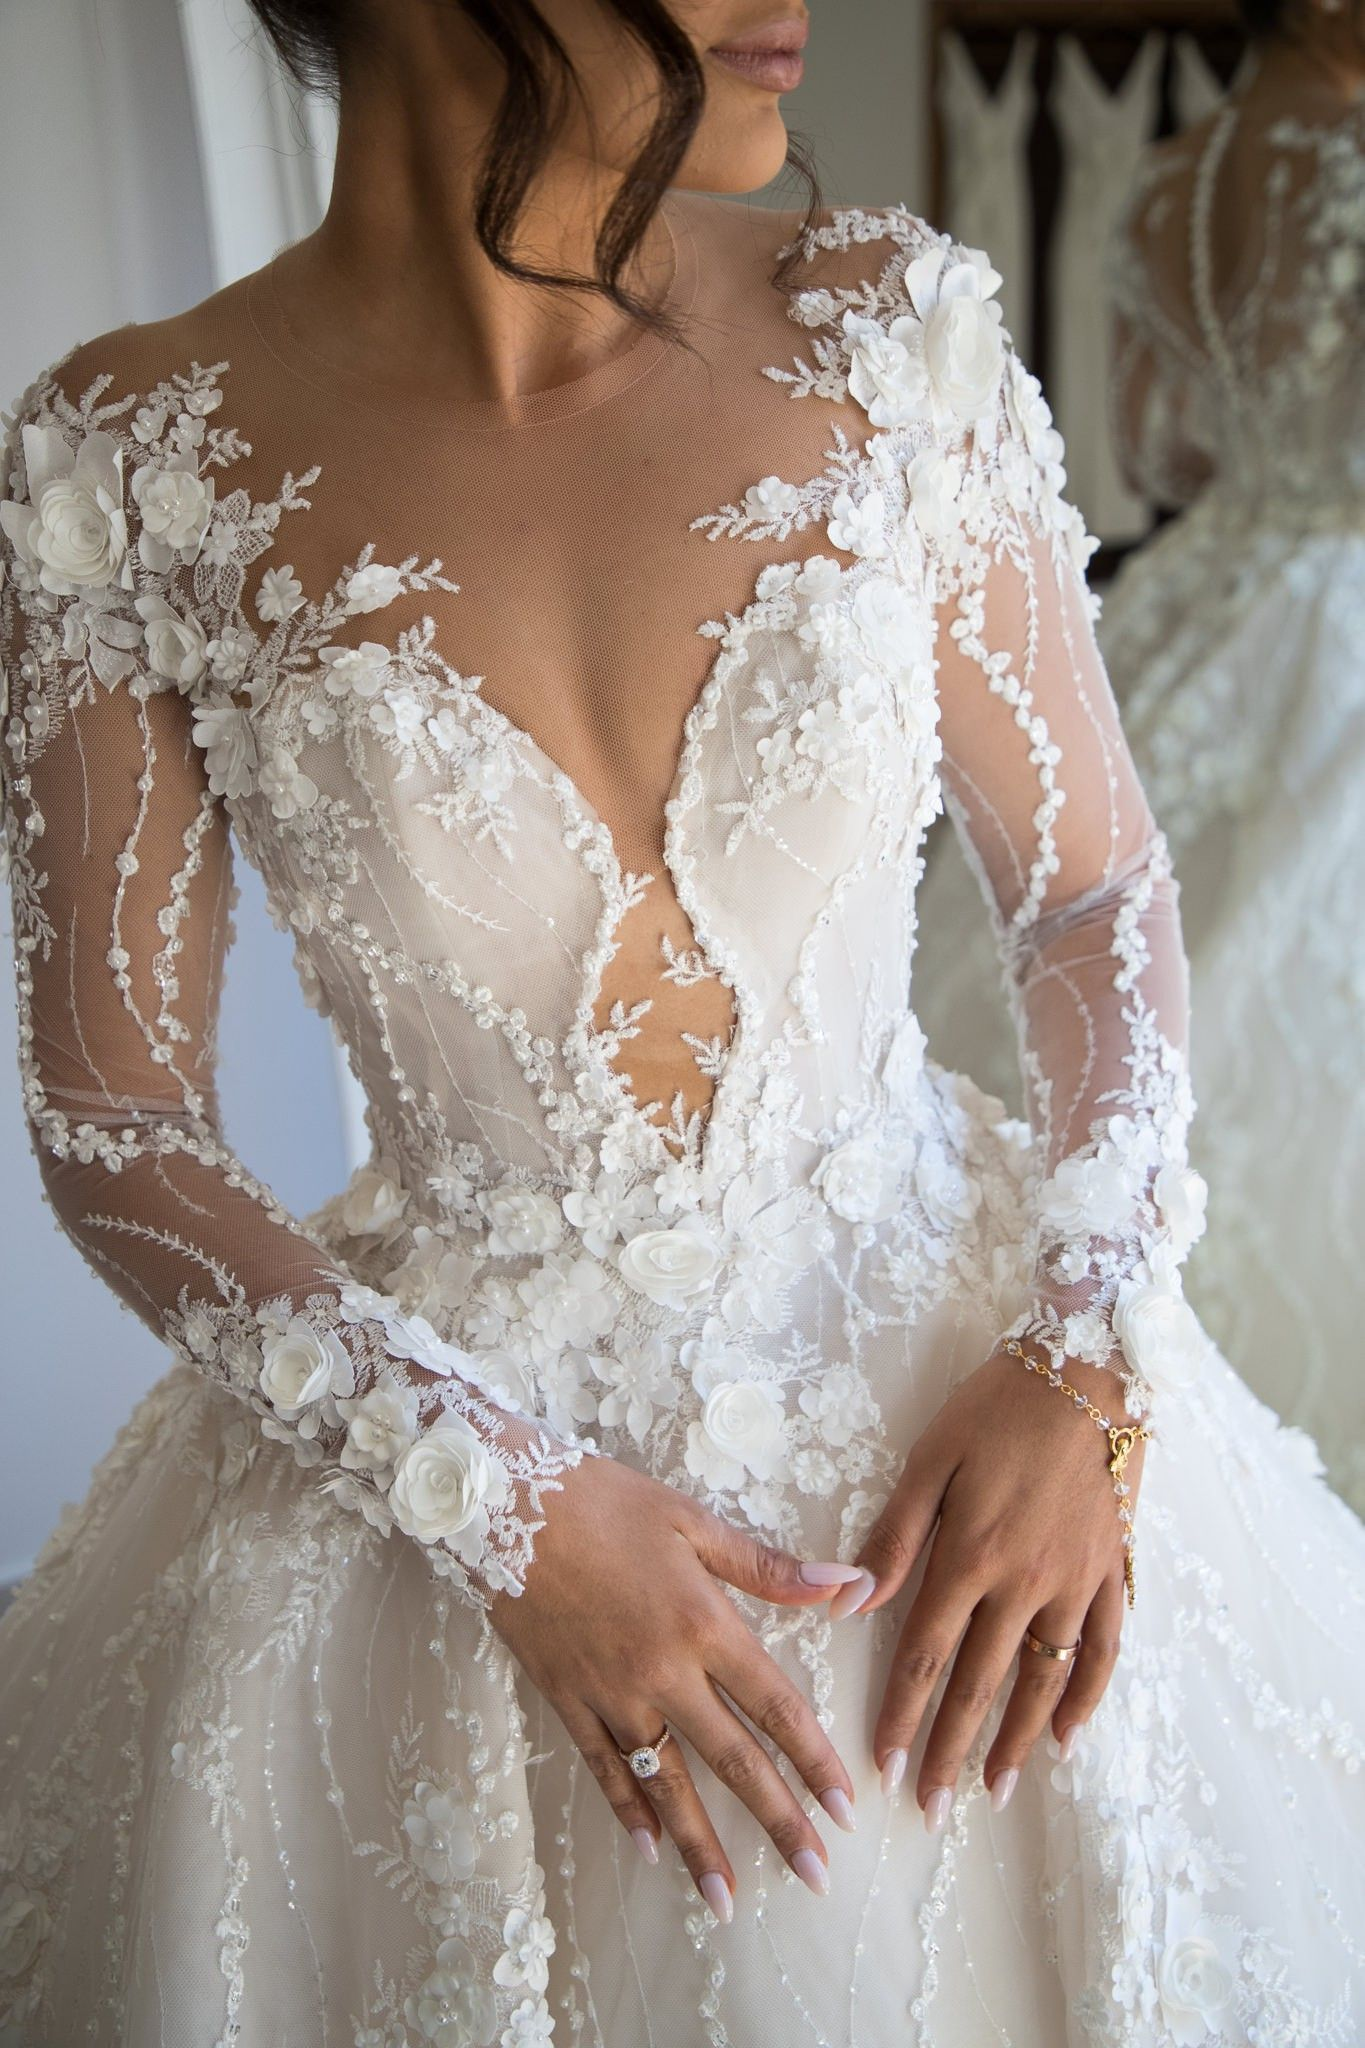 Steven Khalil Custom Made Wedding Dress - #Custom #dress #Khalil #MADE #Steven #wedding